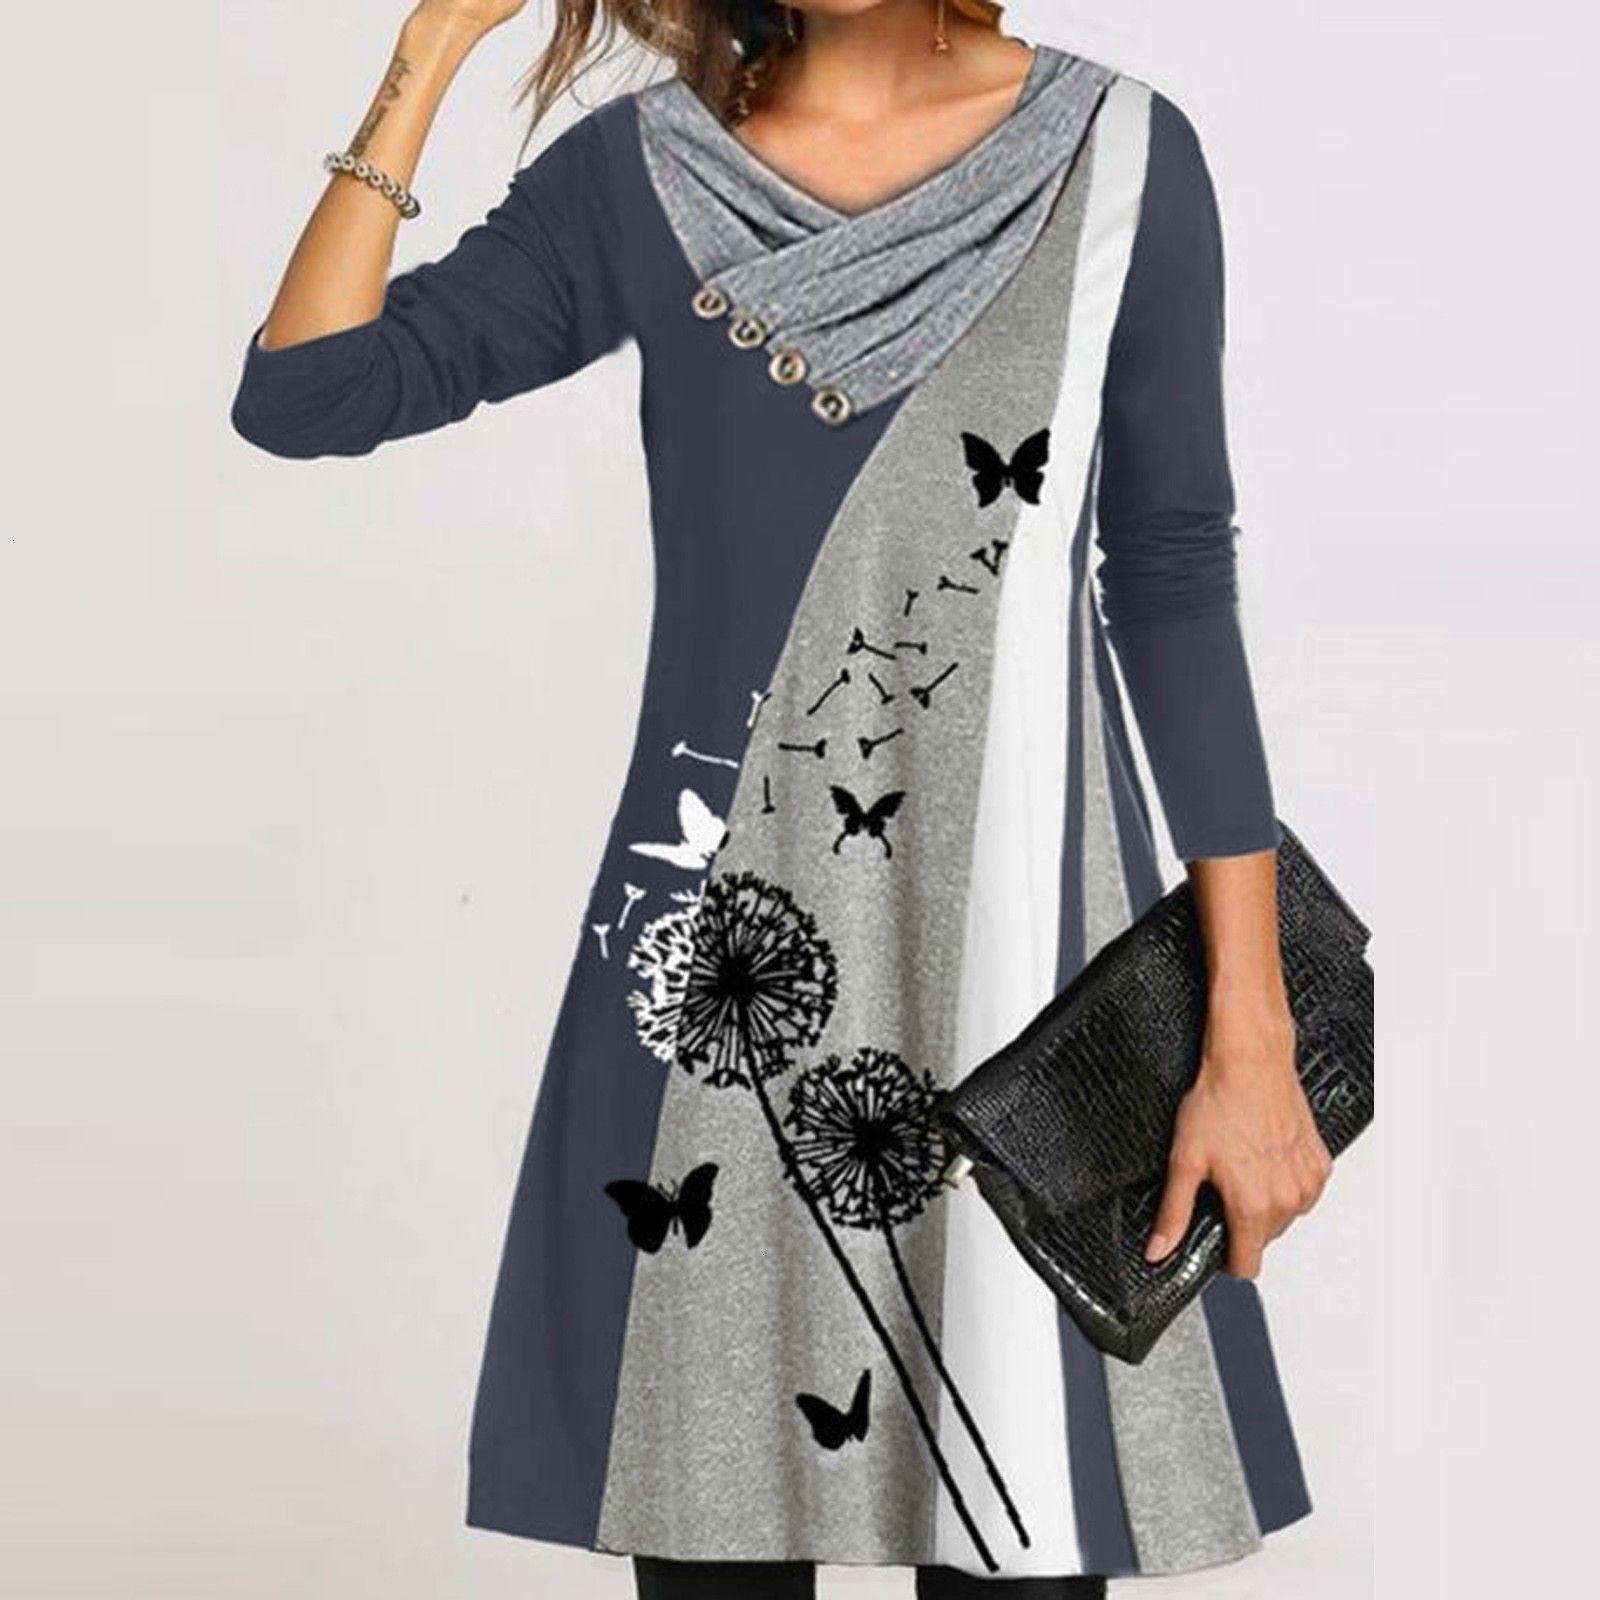 Dress 40. # Fiori femminili ES Stampato Stiksels Stiksels Stiksels Stikwork Pulsante V-Collar lungo Mouwen Comodi tela